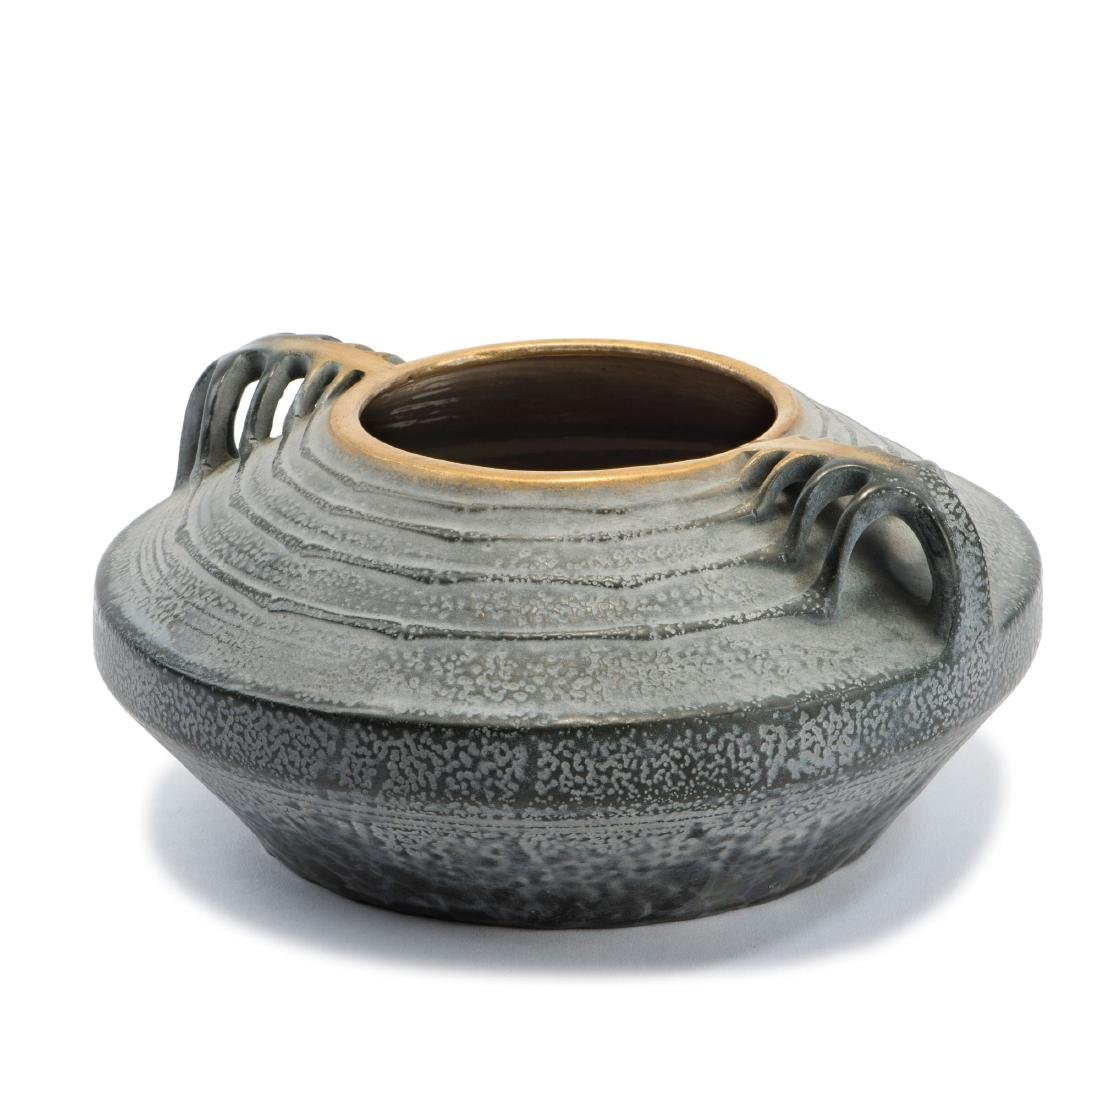 Vase with handles, c1902